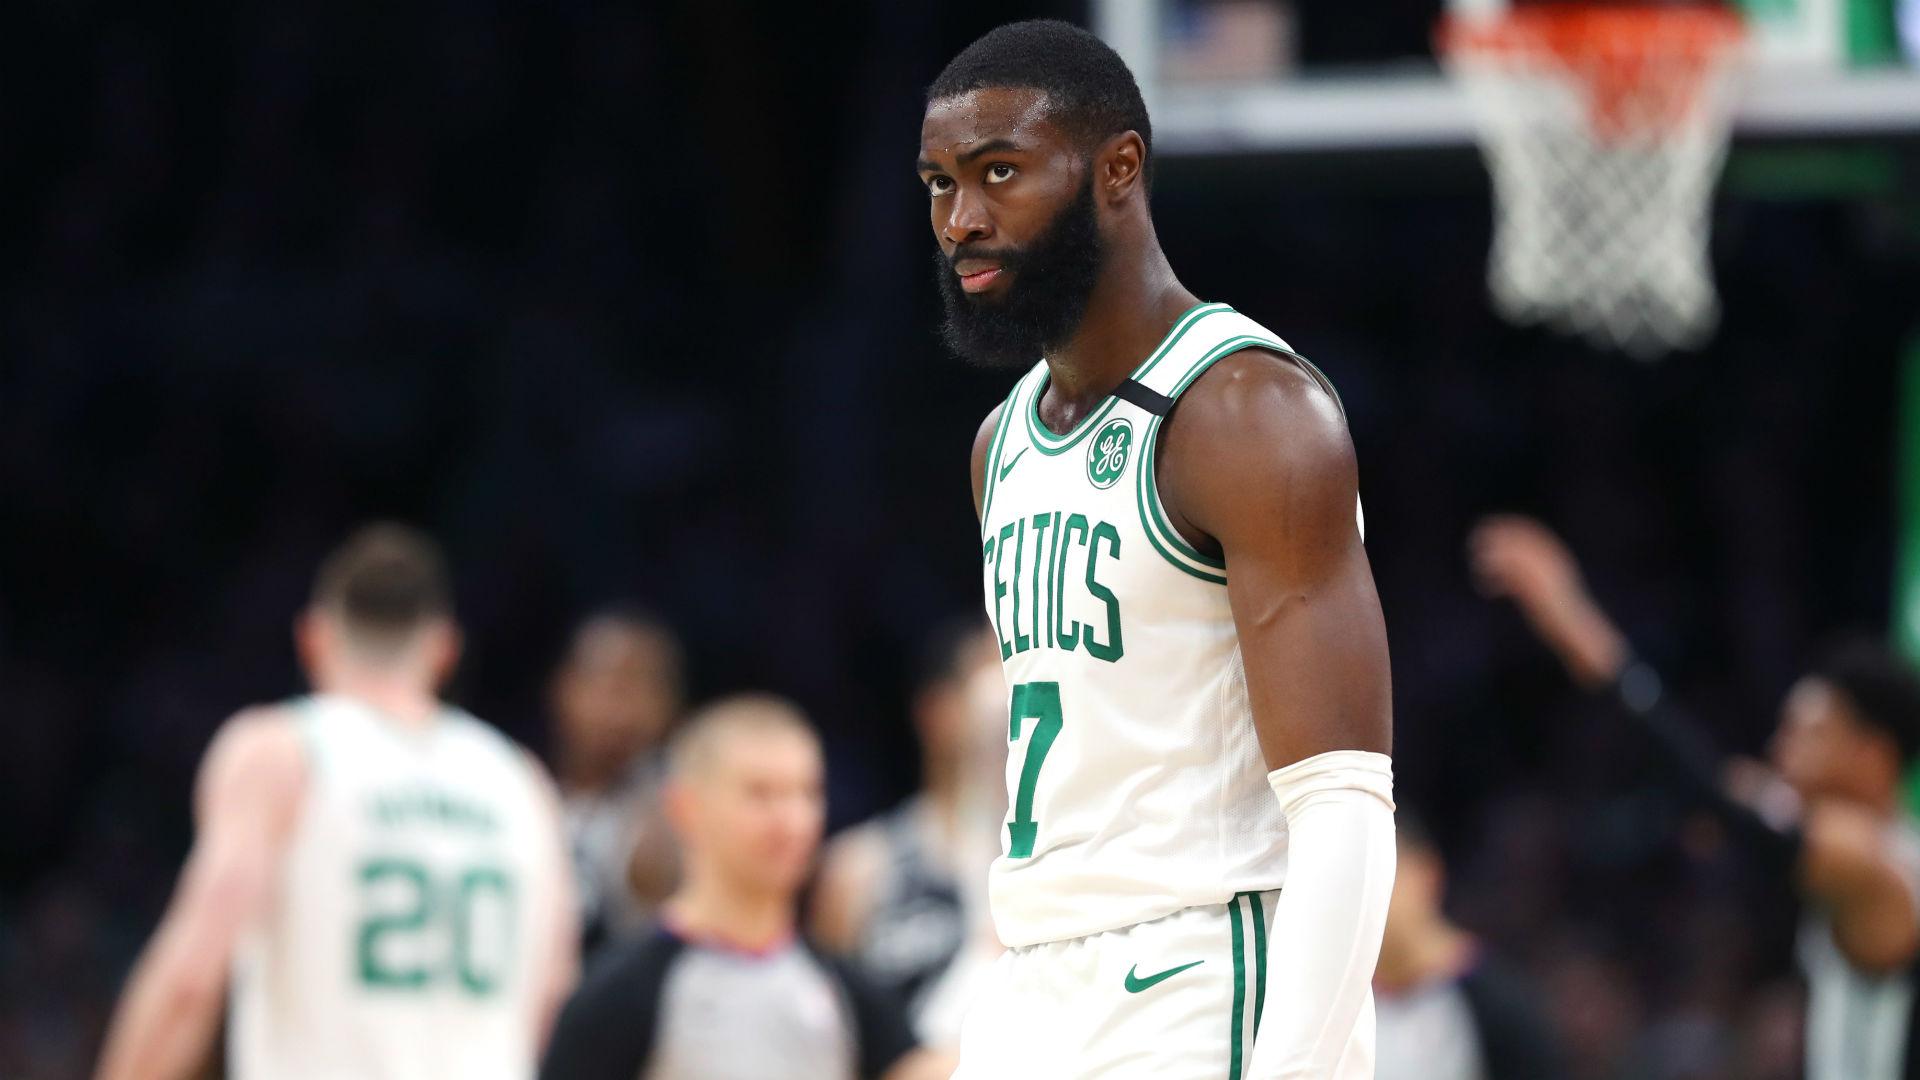 Jaylen Brown injury update: Celtics announce timetable for wing's return in '21-22 season